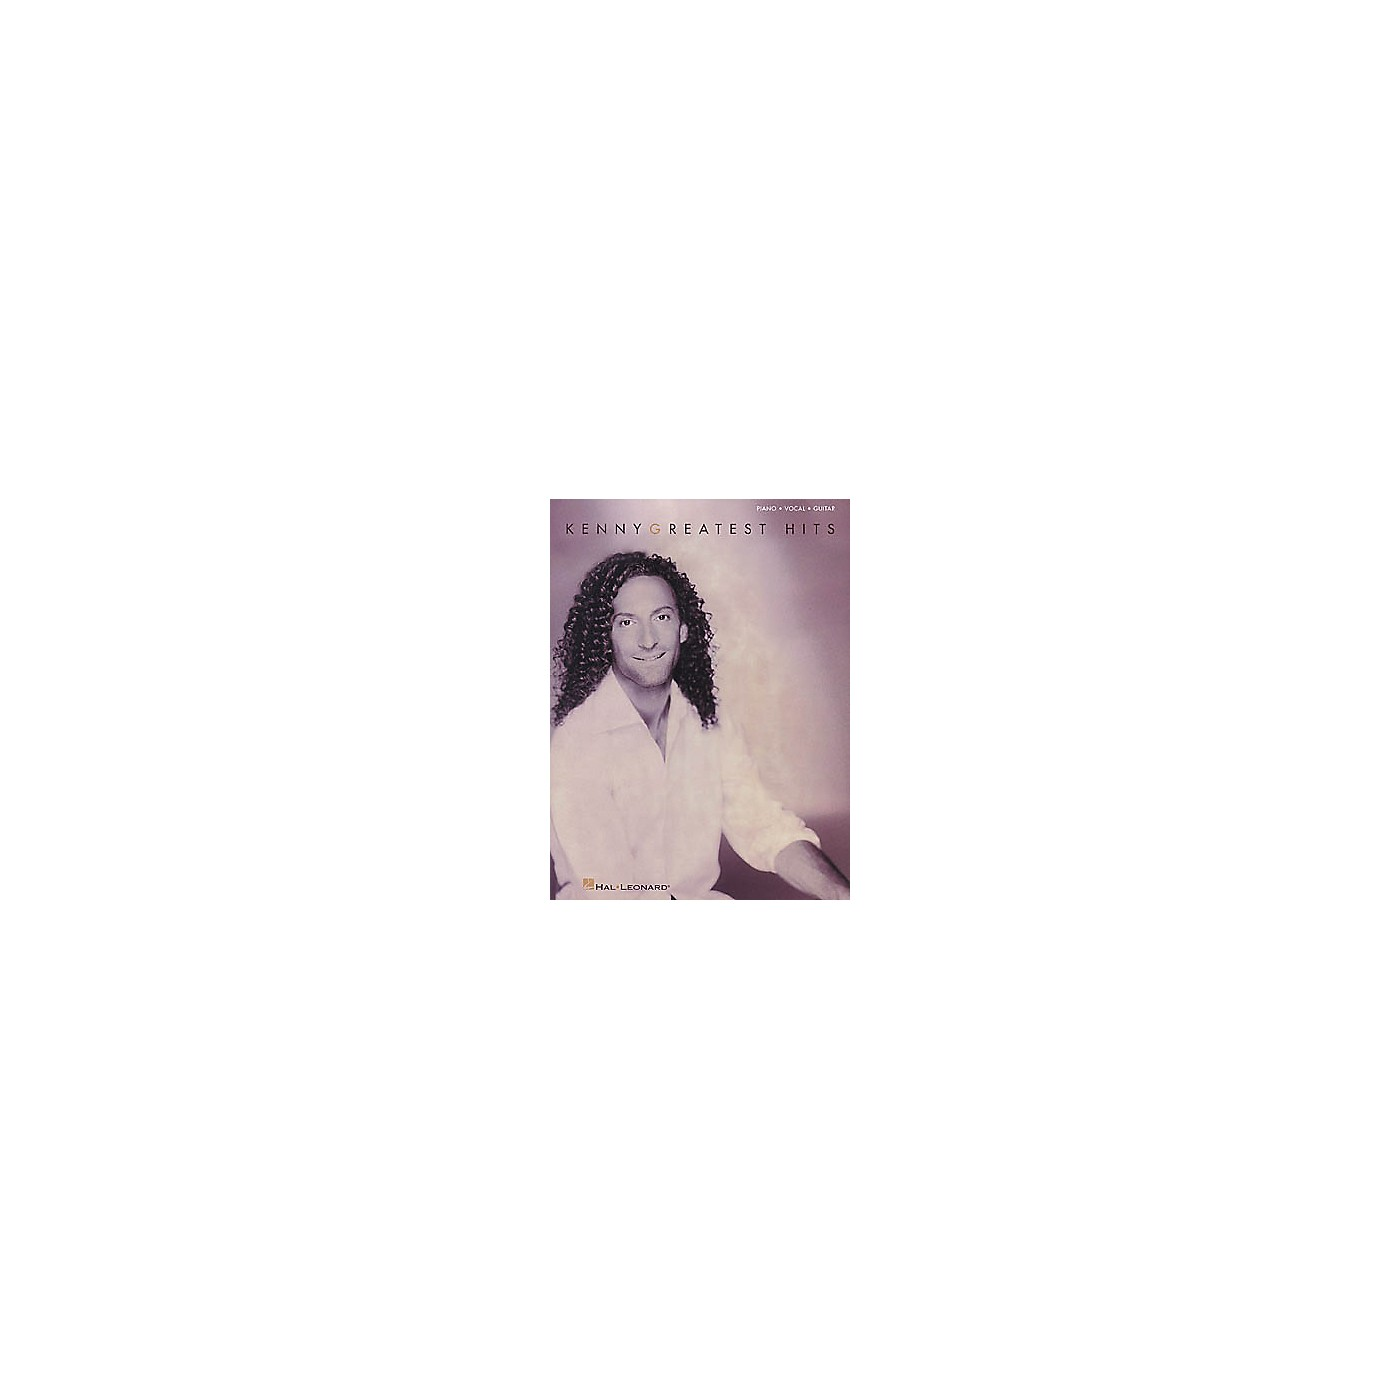 Hal Leonard Kenny G - Greatest Hits Songbook thumbnail